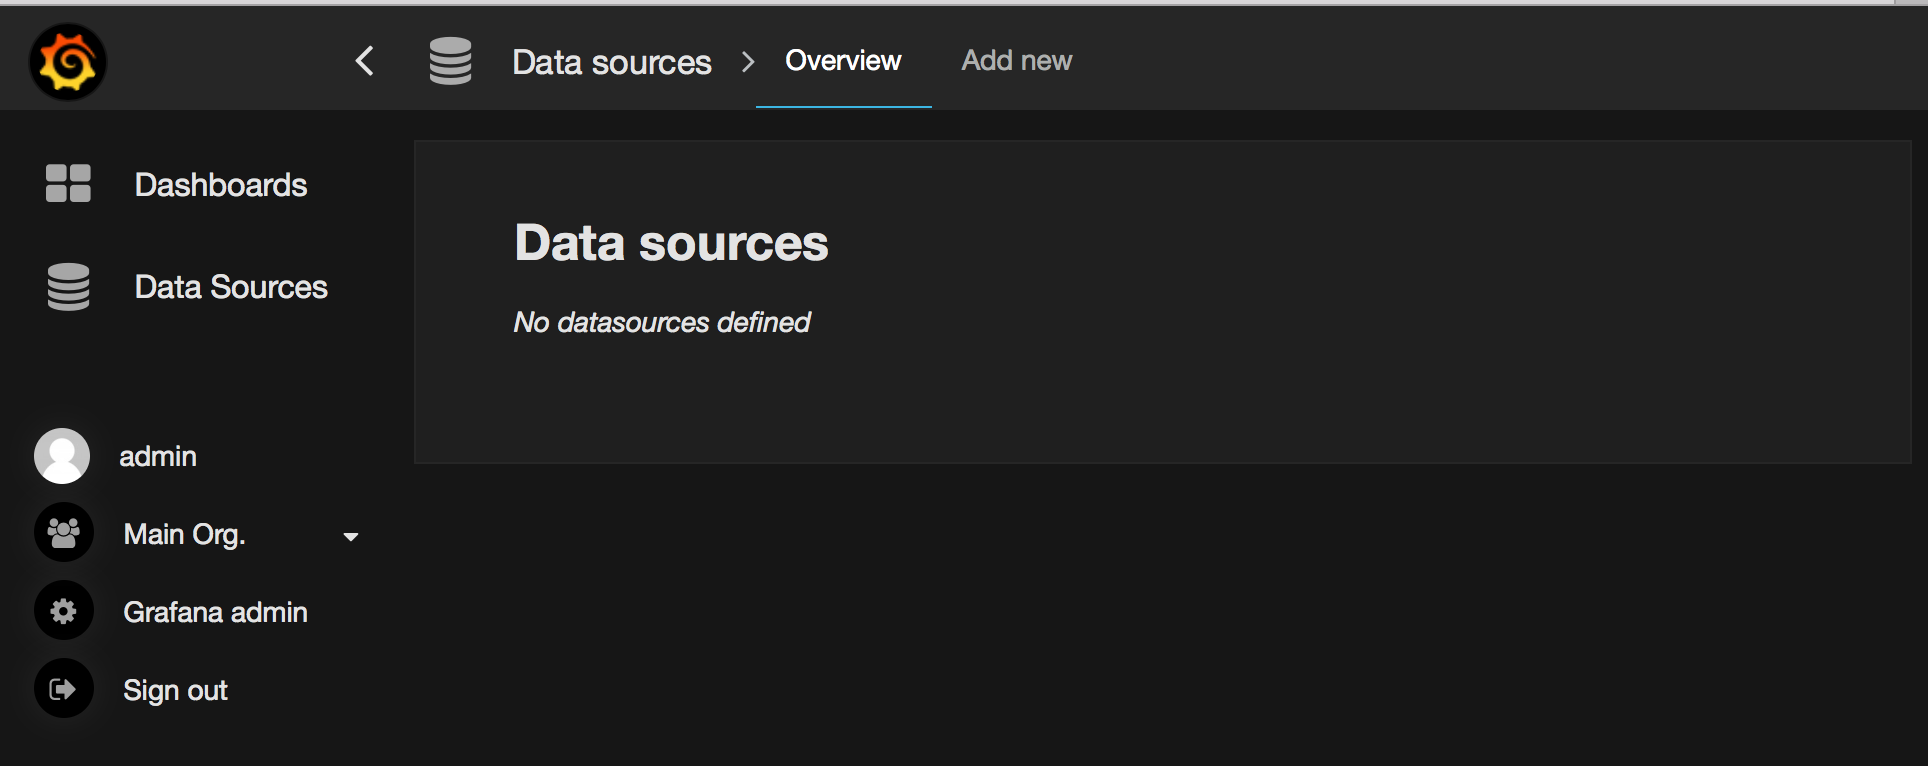 Using InfluxDB + Grafana to Display Network Statistics